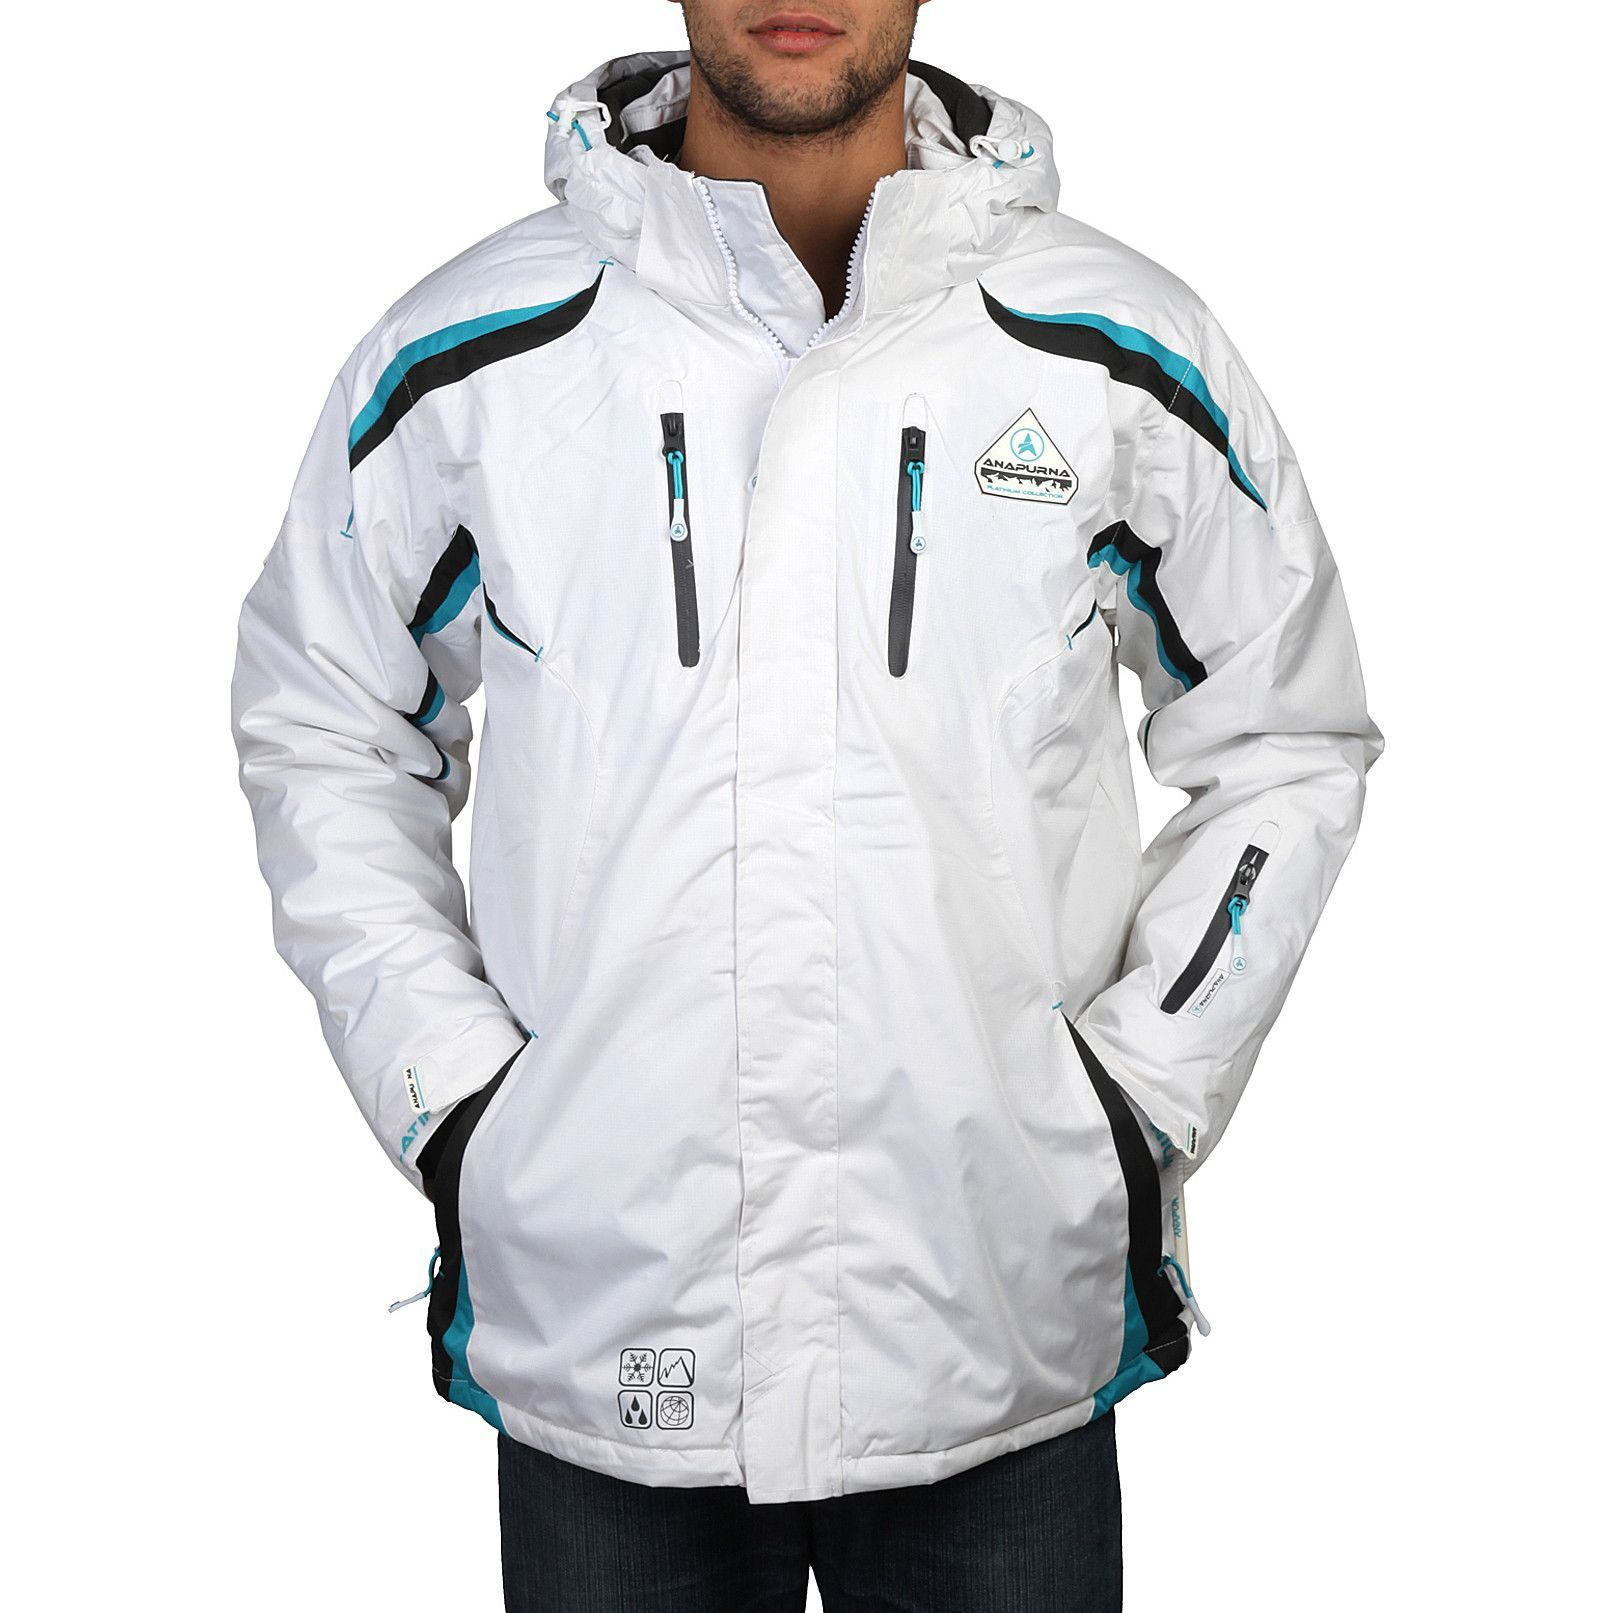 Geographical Norway Wesc_man_jacket_white | Tøj